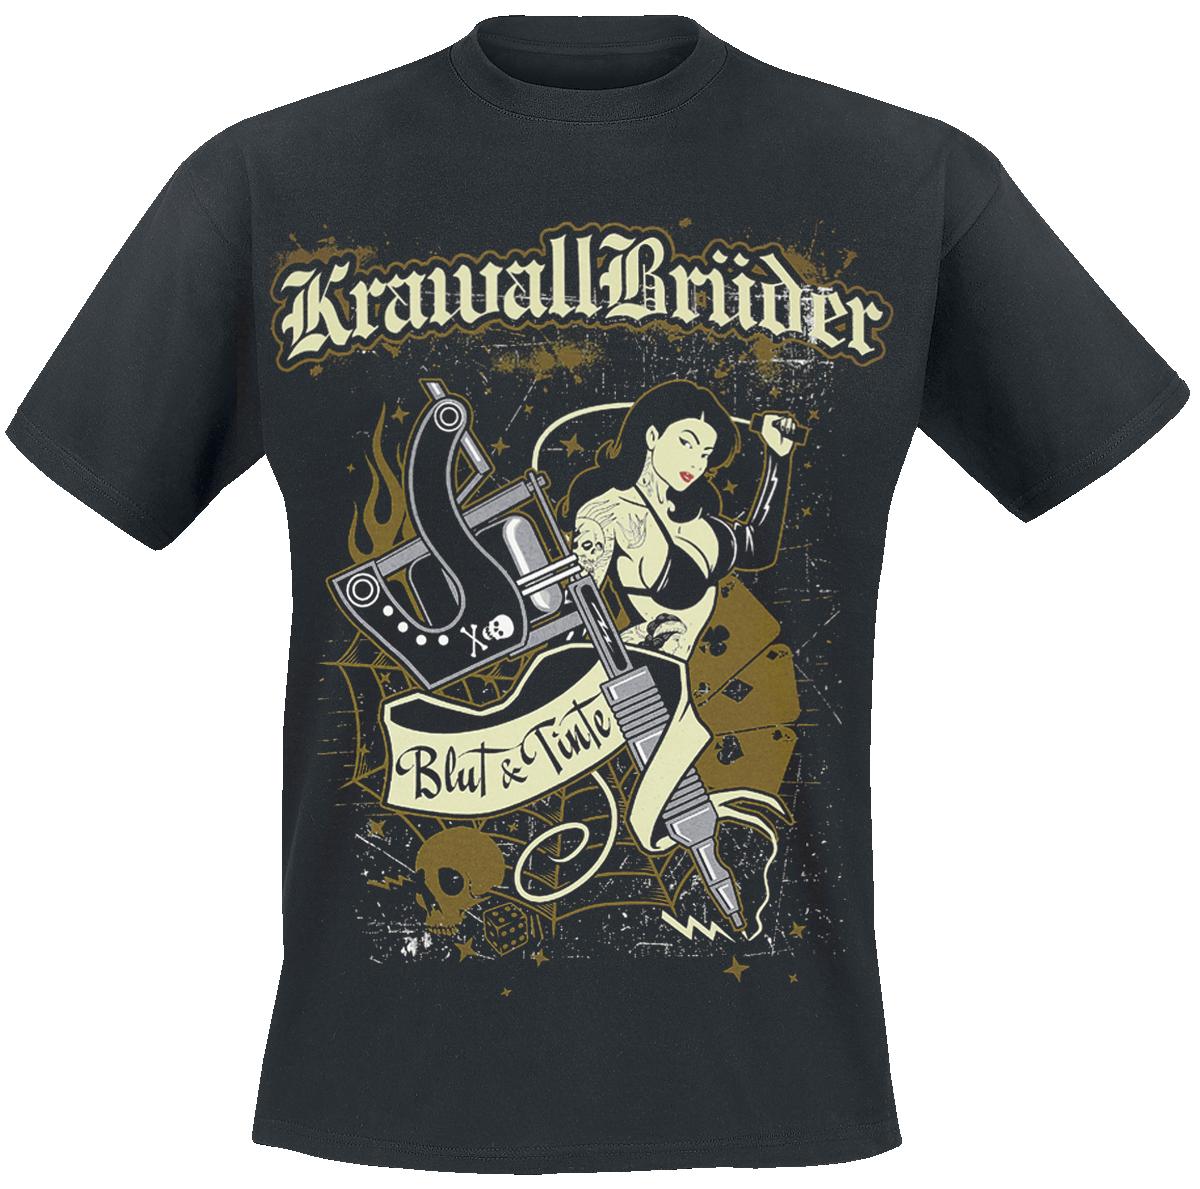 KrawallBrüder - Blut und Tinte - T-Shirt - black image